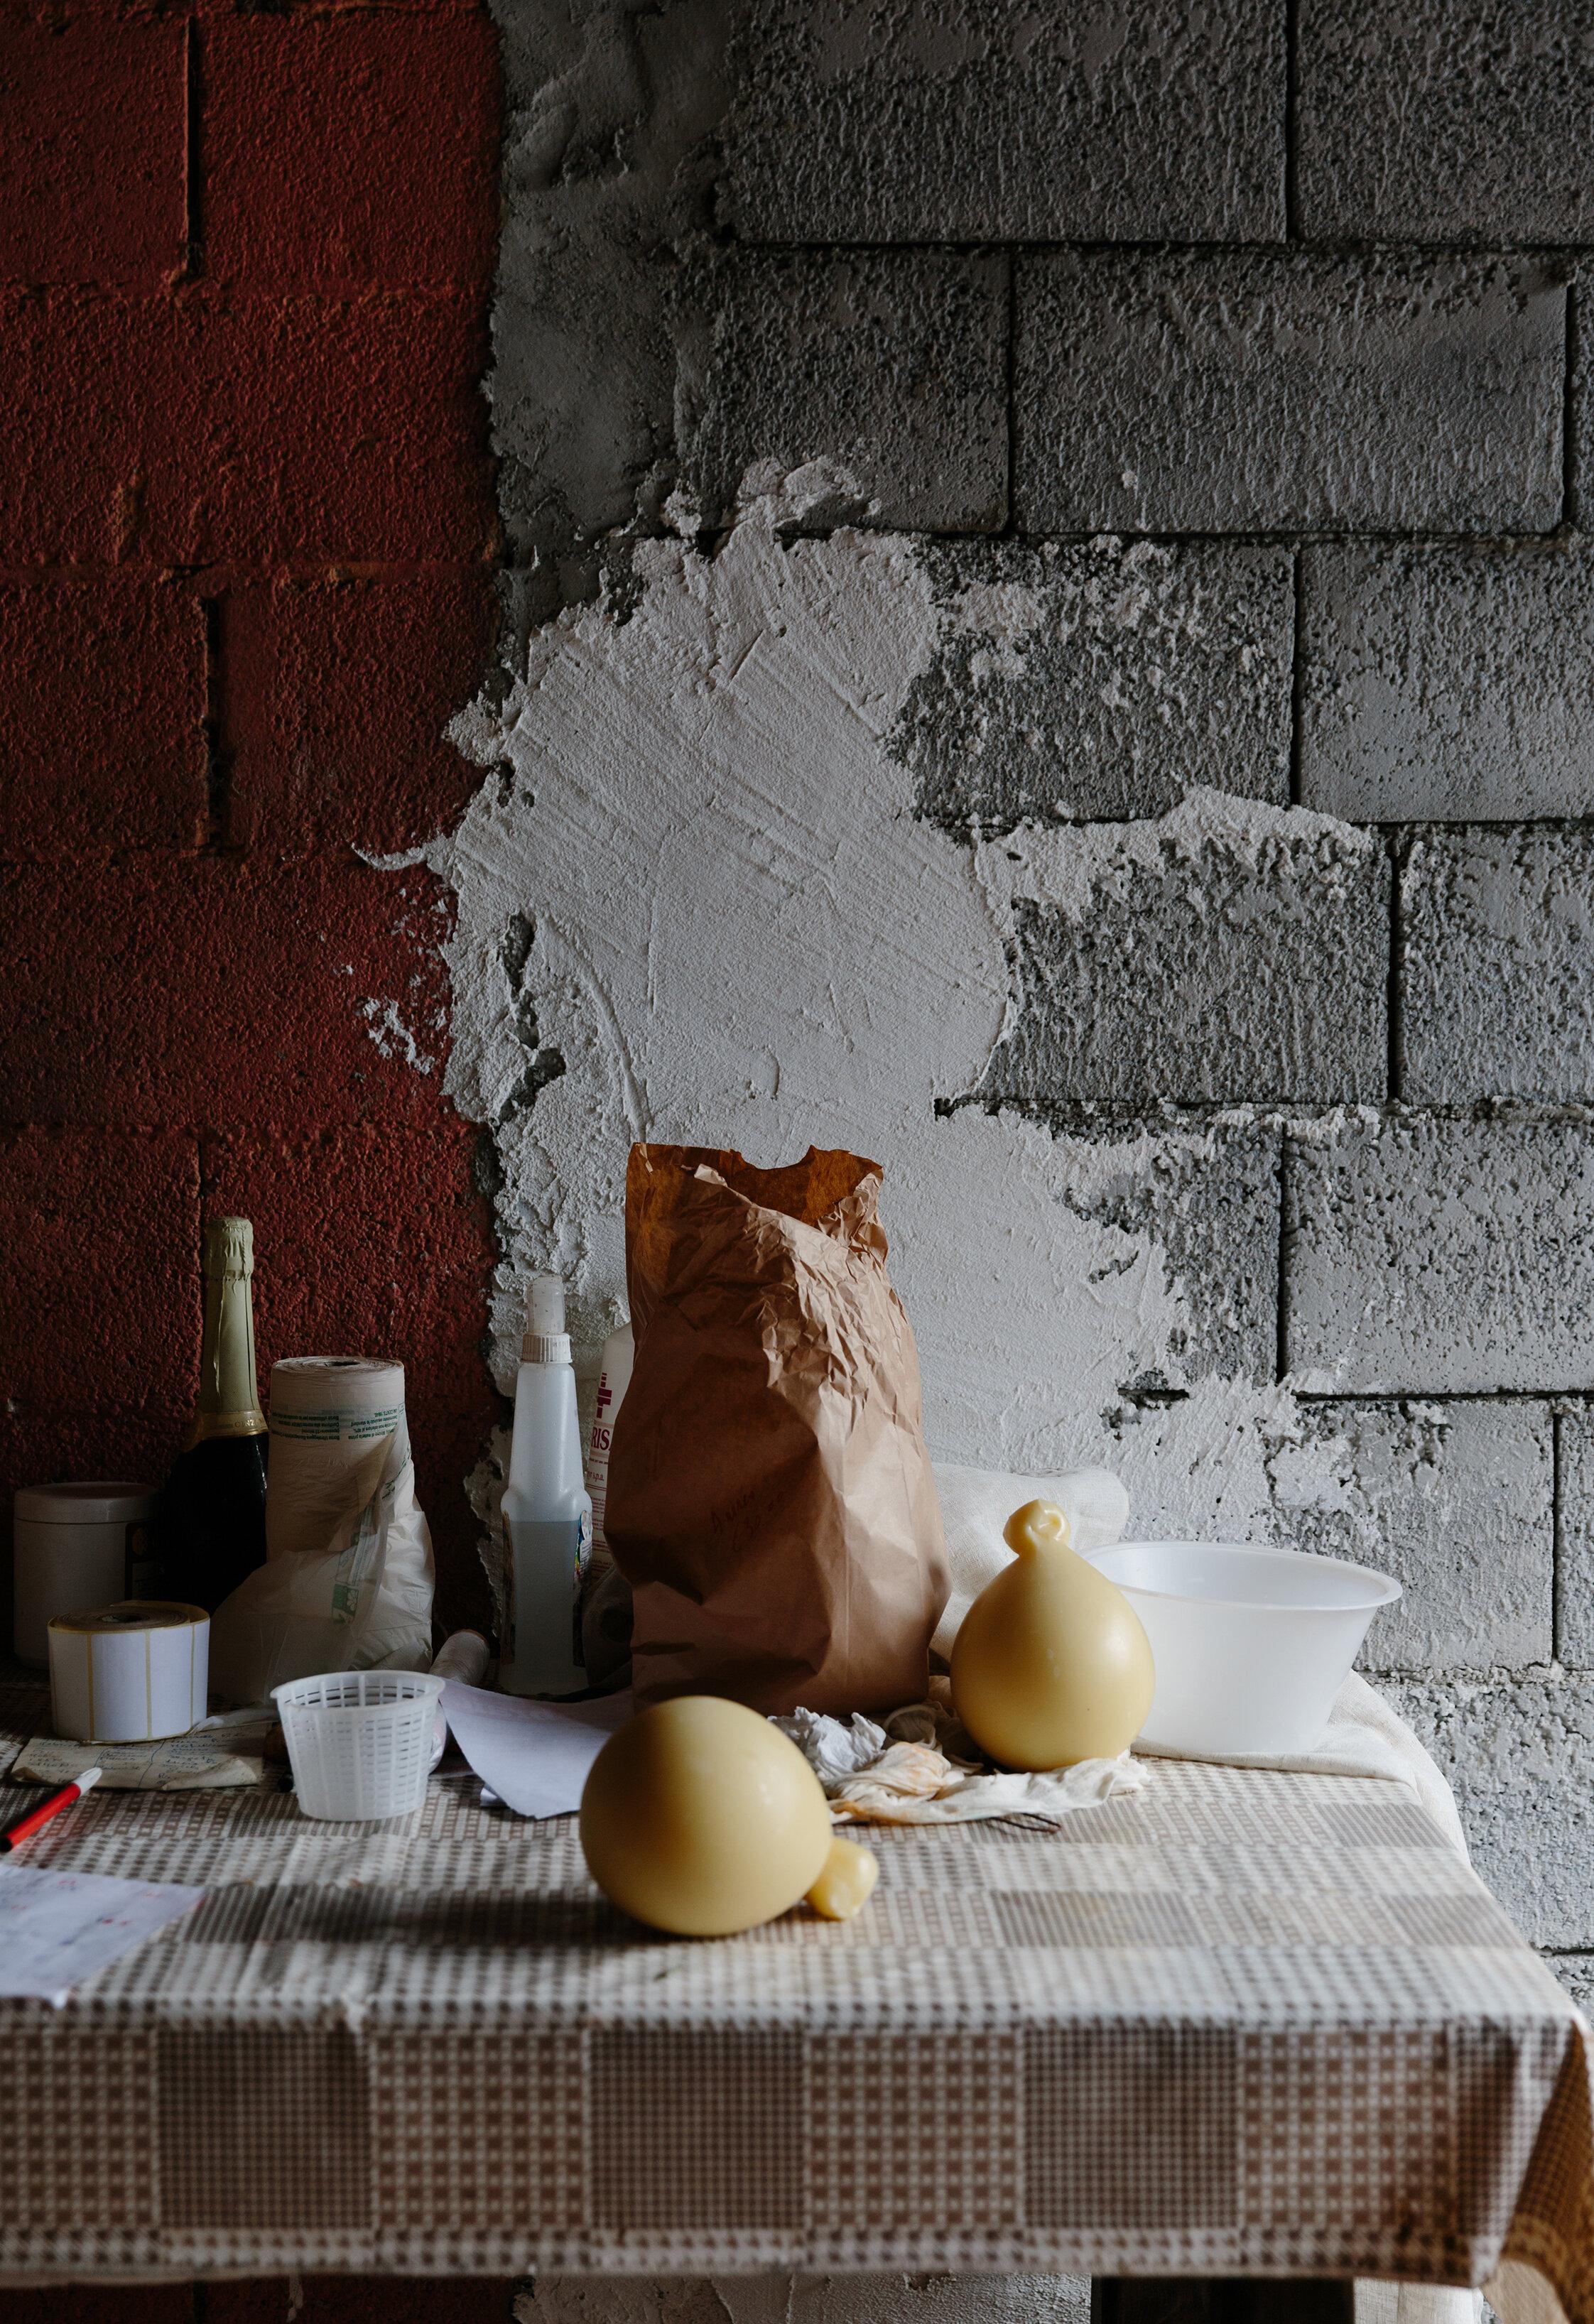 Maria-Bell-Photography-freelance-photographer-2.jpg